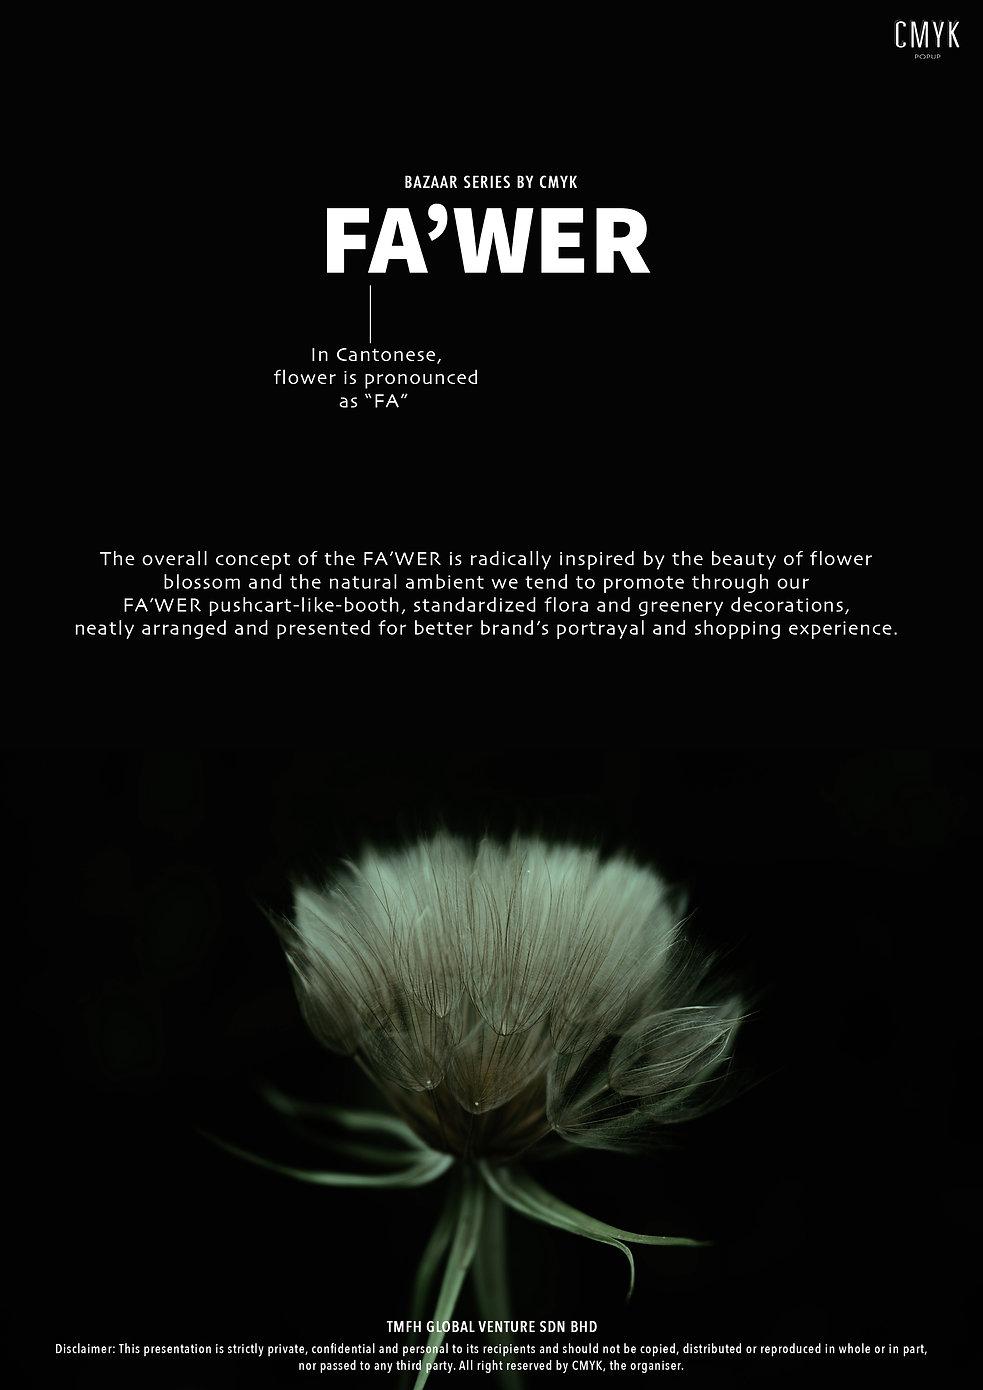 FAWER3.jpg